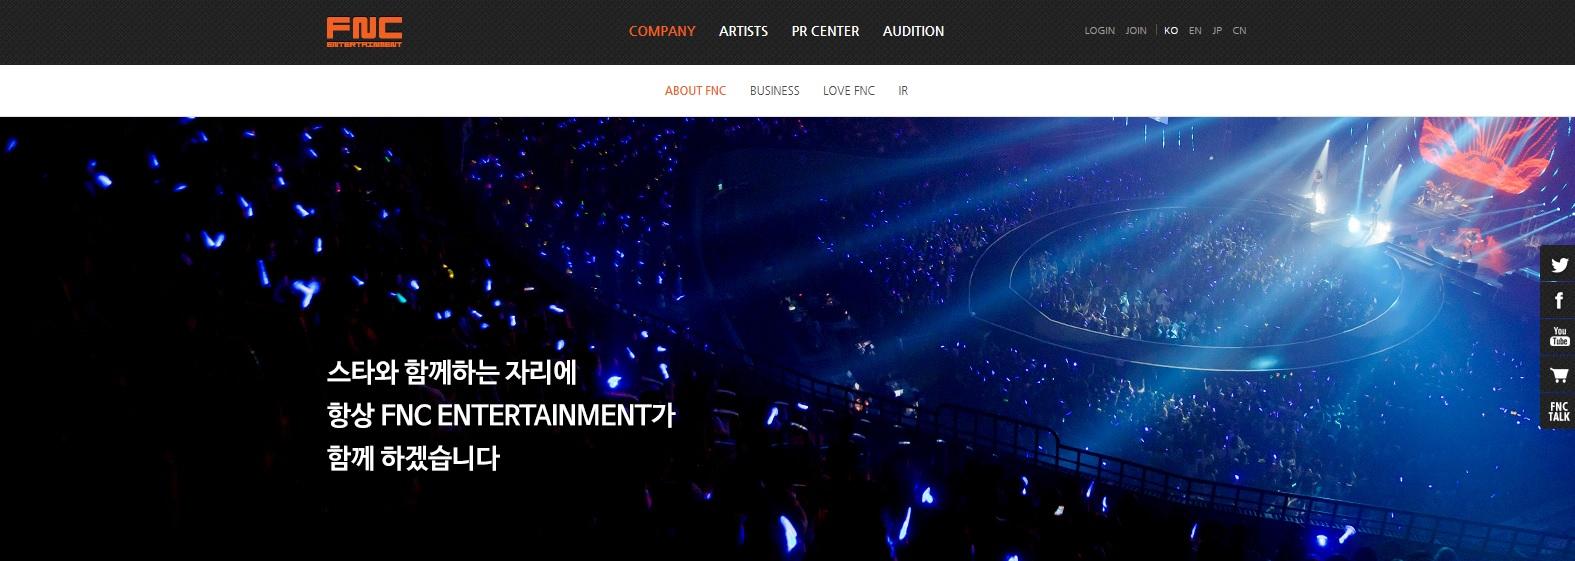 FNC엔터, 中 최대 민영그룹 '쑤닝 유니버셜 미디어' 330억원 투자유치